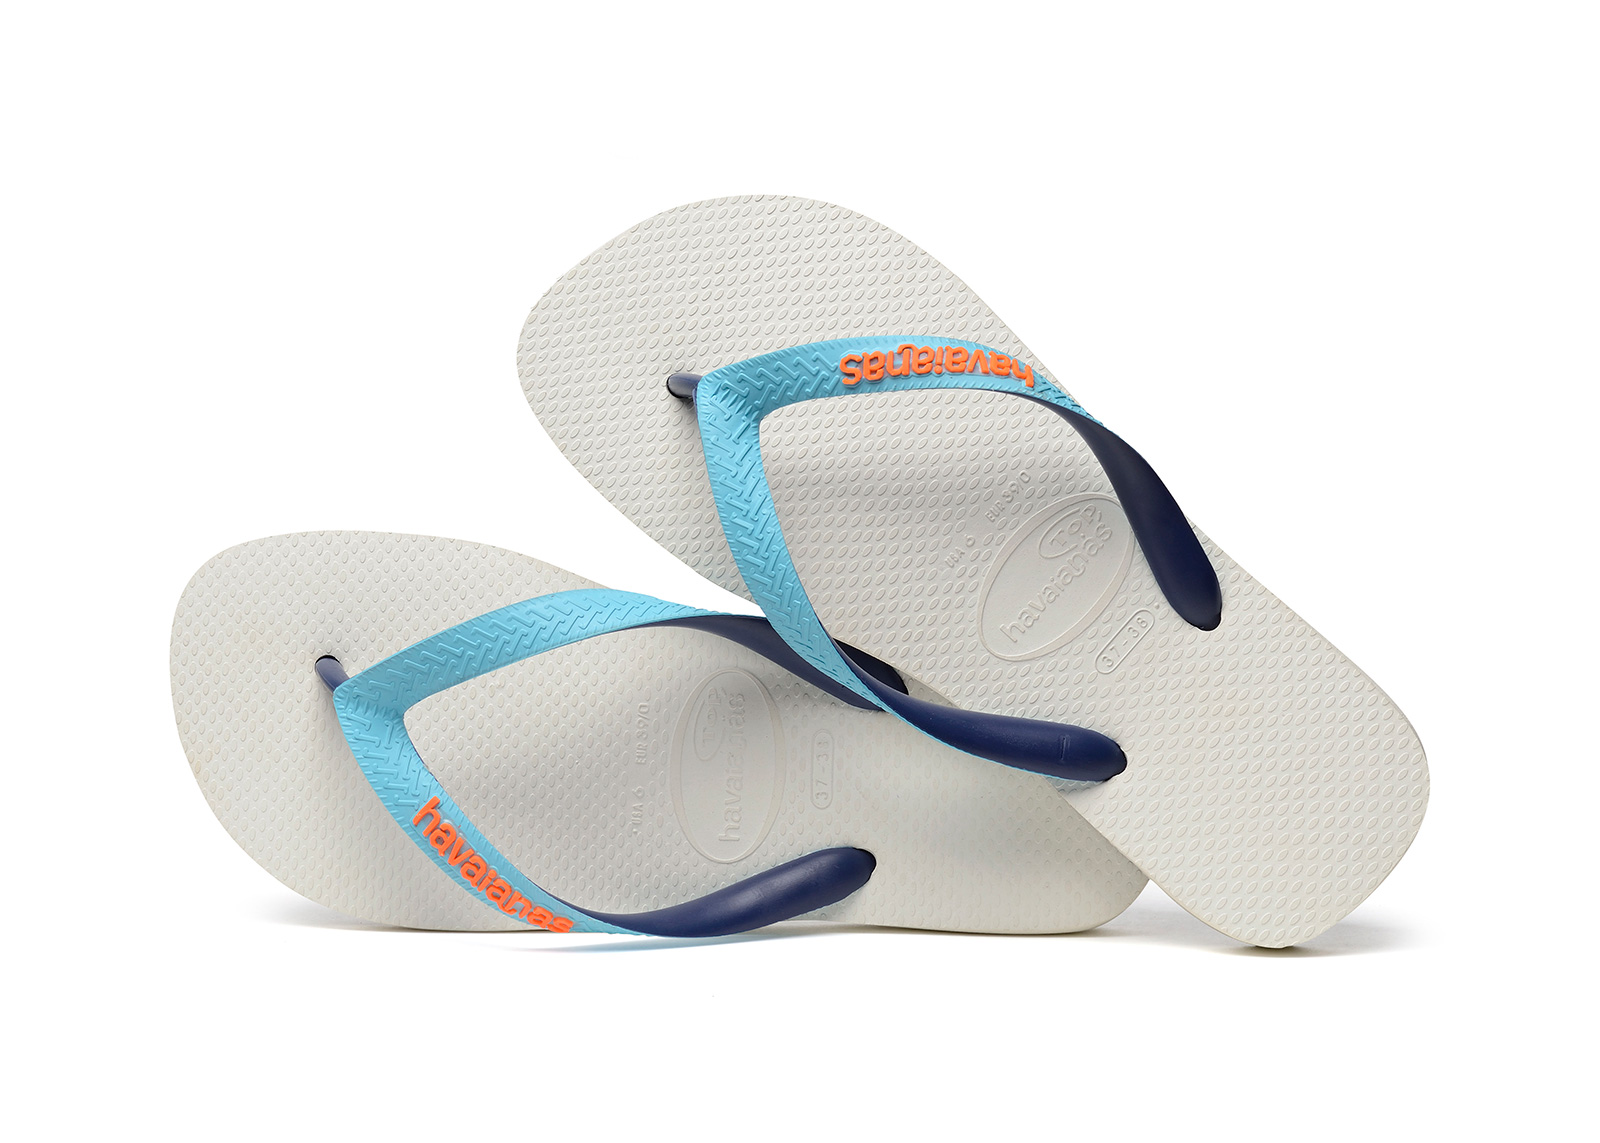 7fc4400ca2a8 Flip-Flops White Flip Flops - Havaianas Top Mix White blue navy